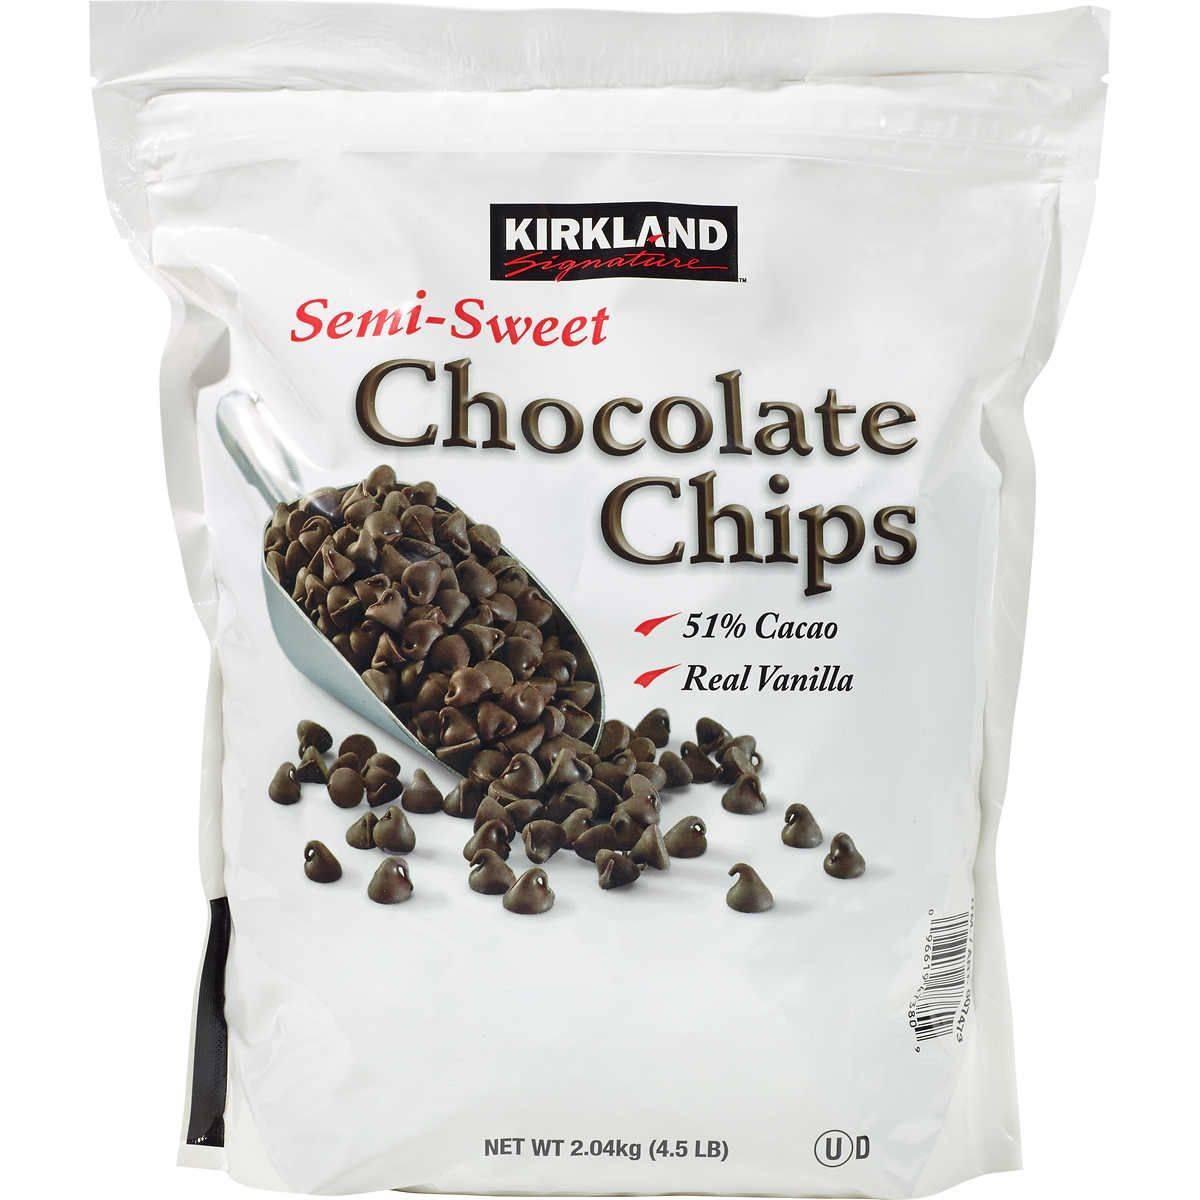 Kirkland Signature Semi-Sweet Chocolate Chips, 4.5lbs